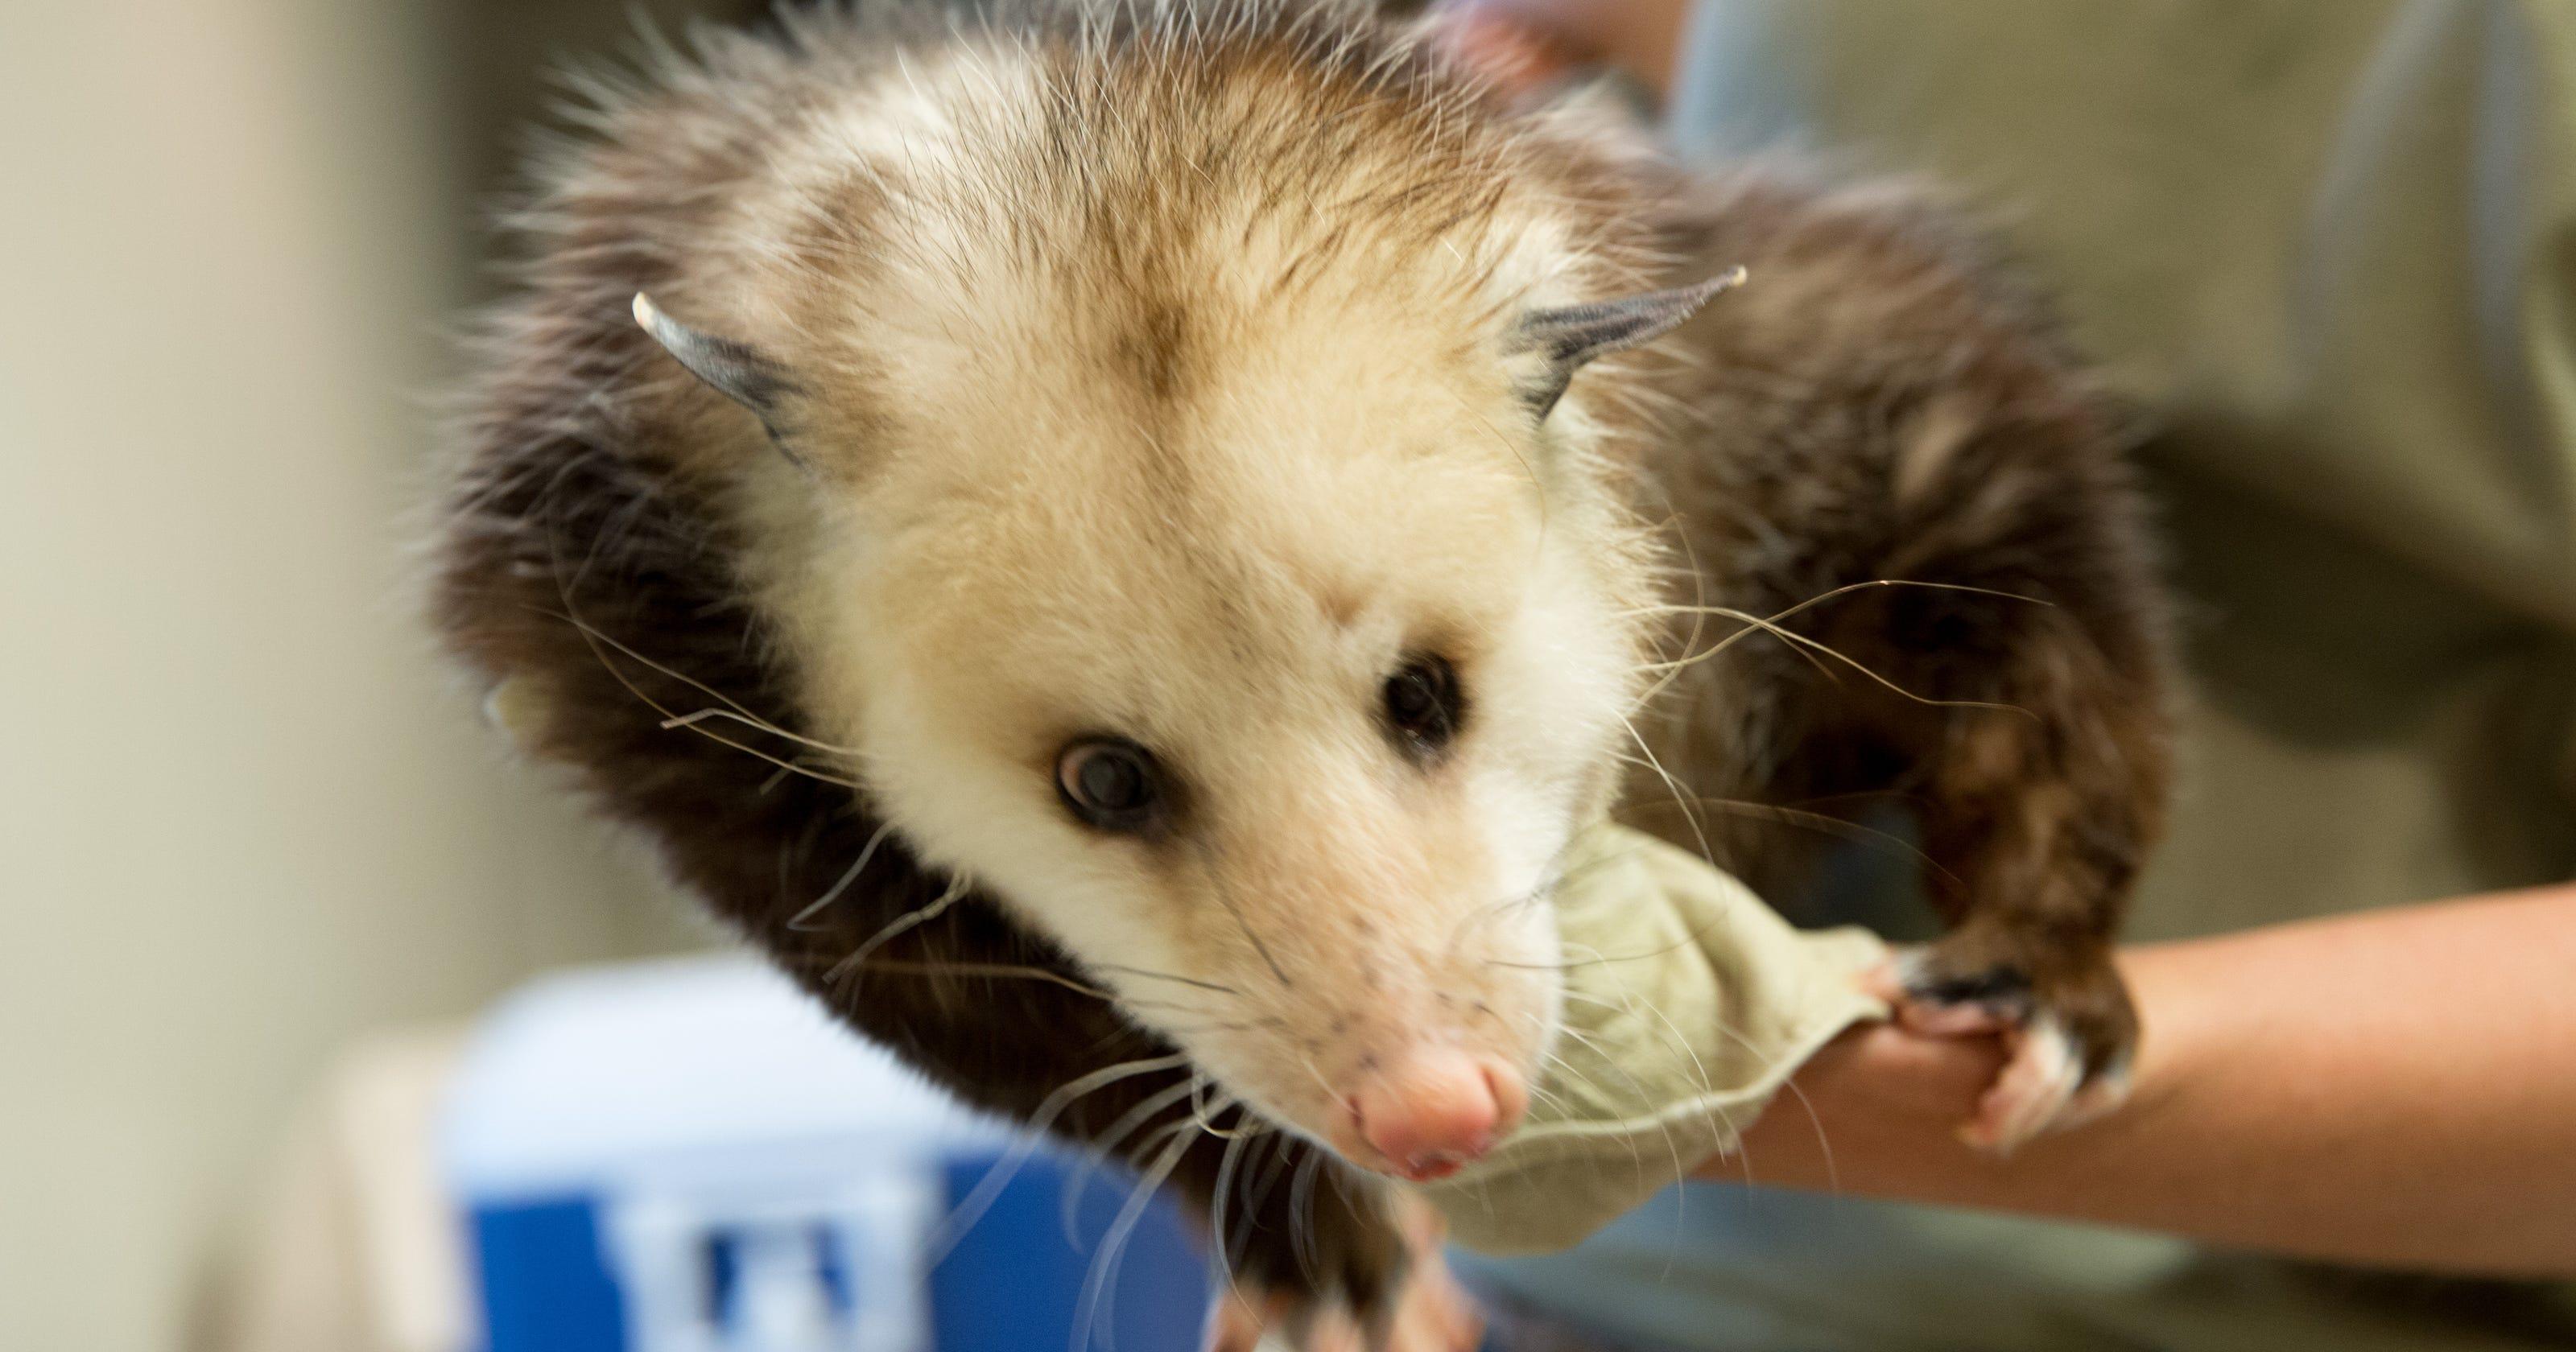 3 Iowa teens accused of beating live opossum on video